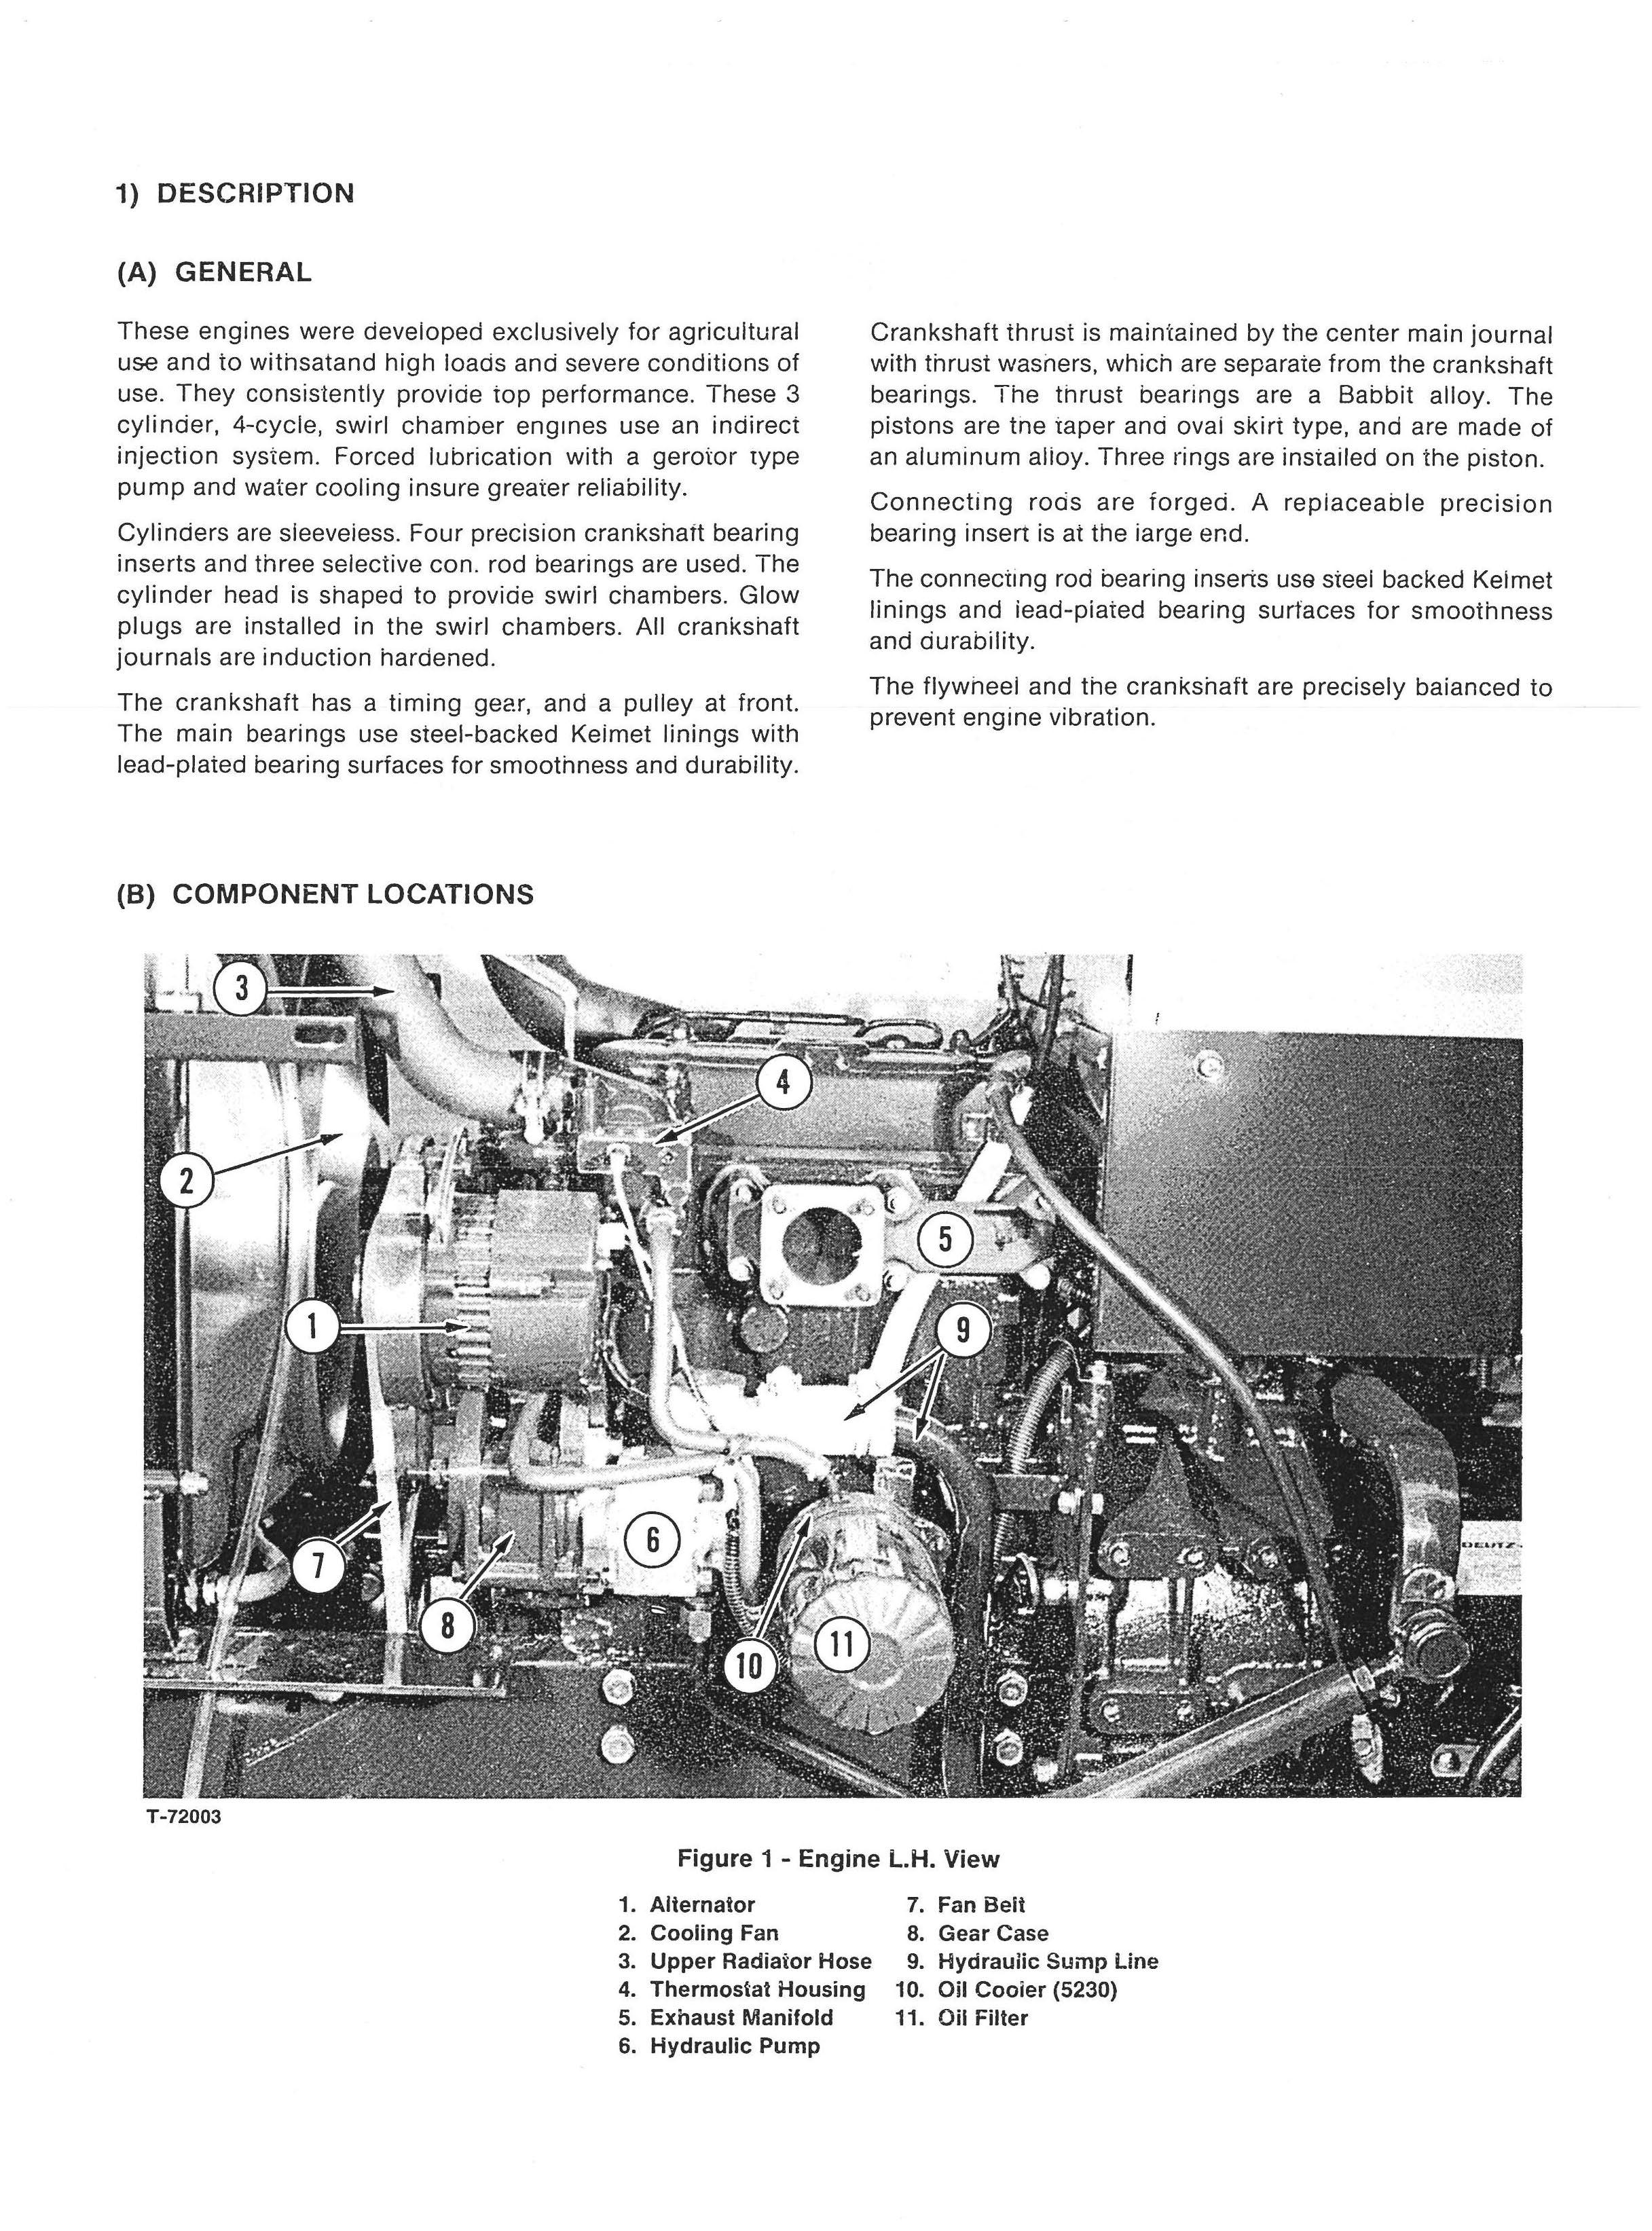 deutz 2016 wiring diagram corolla allis 5220 5230 diesel 2 and 4wd synchro lawn